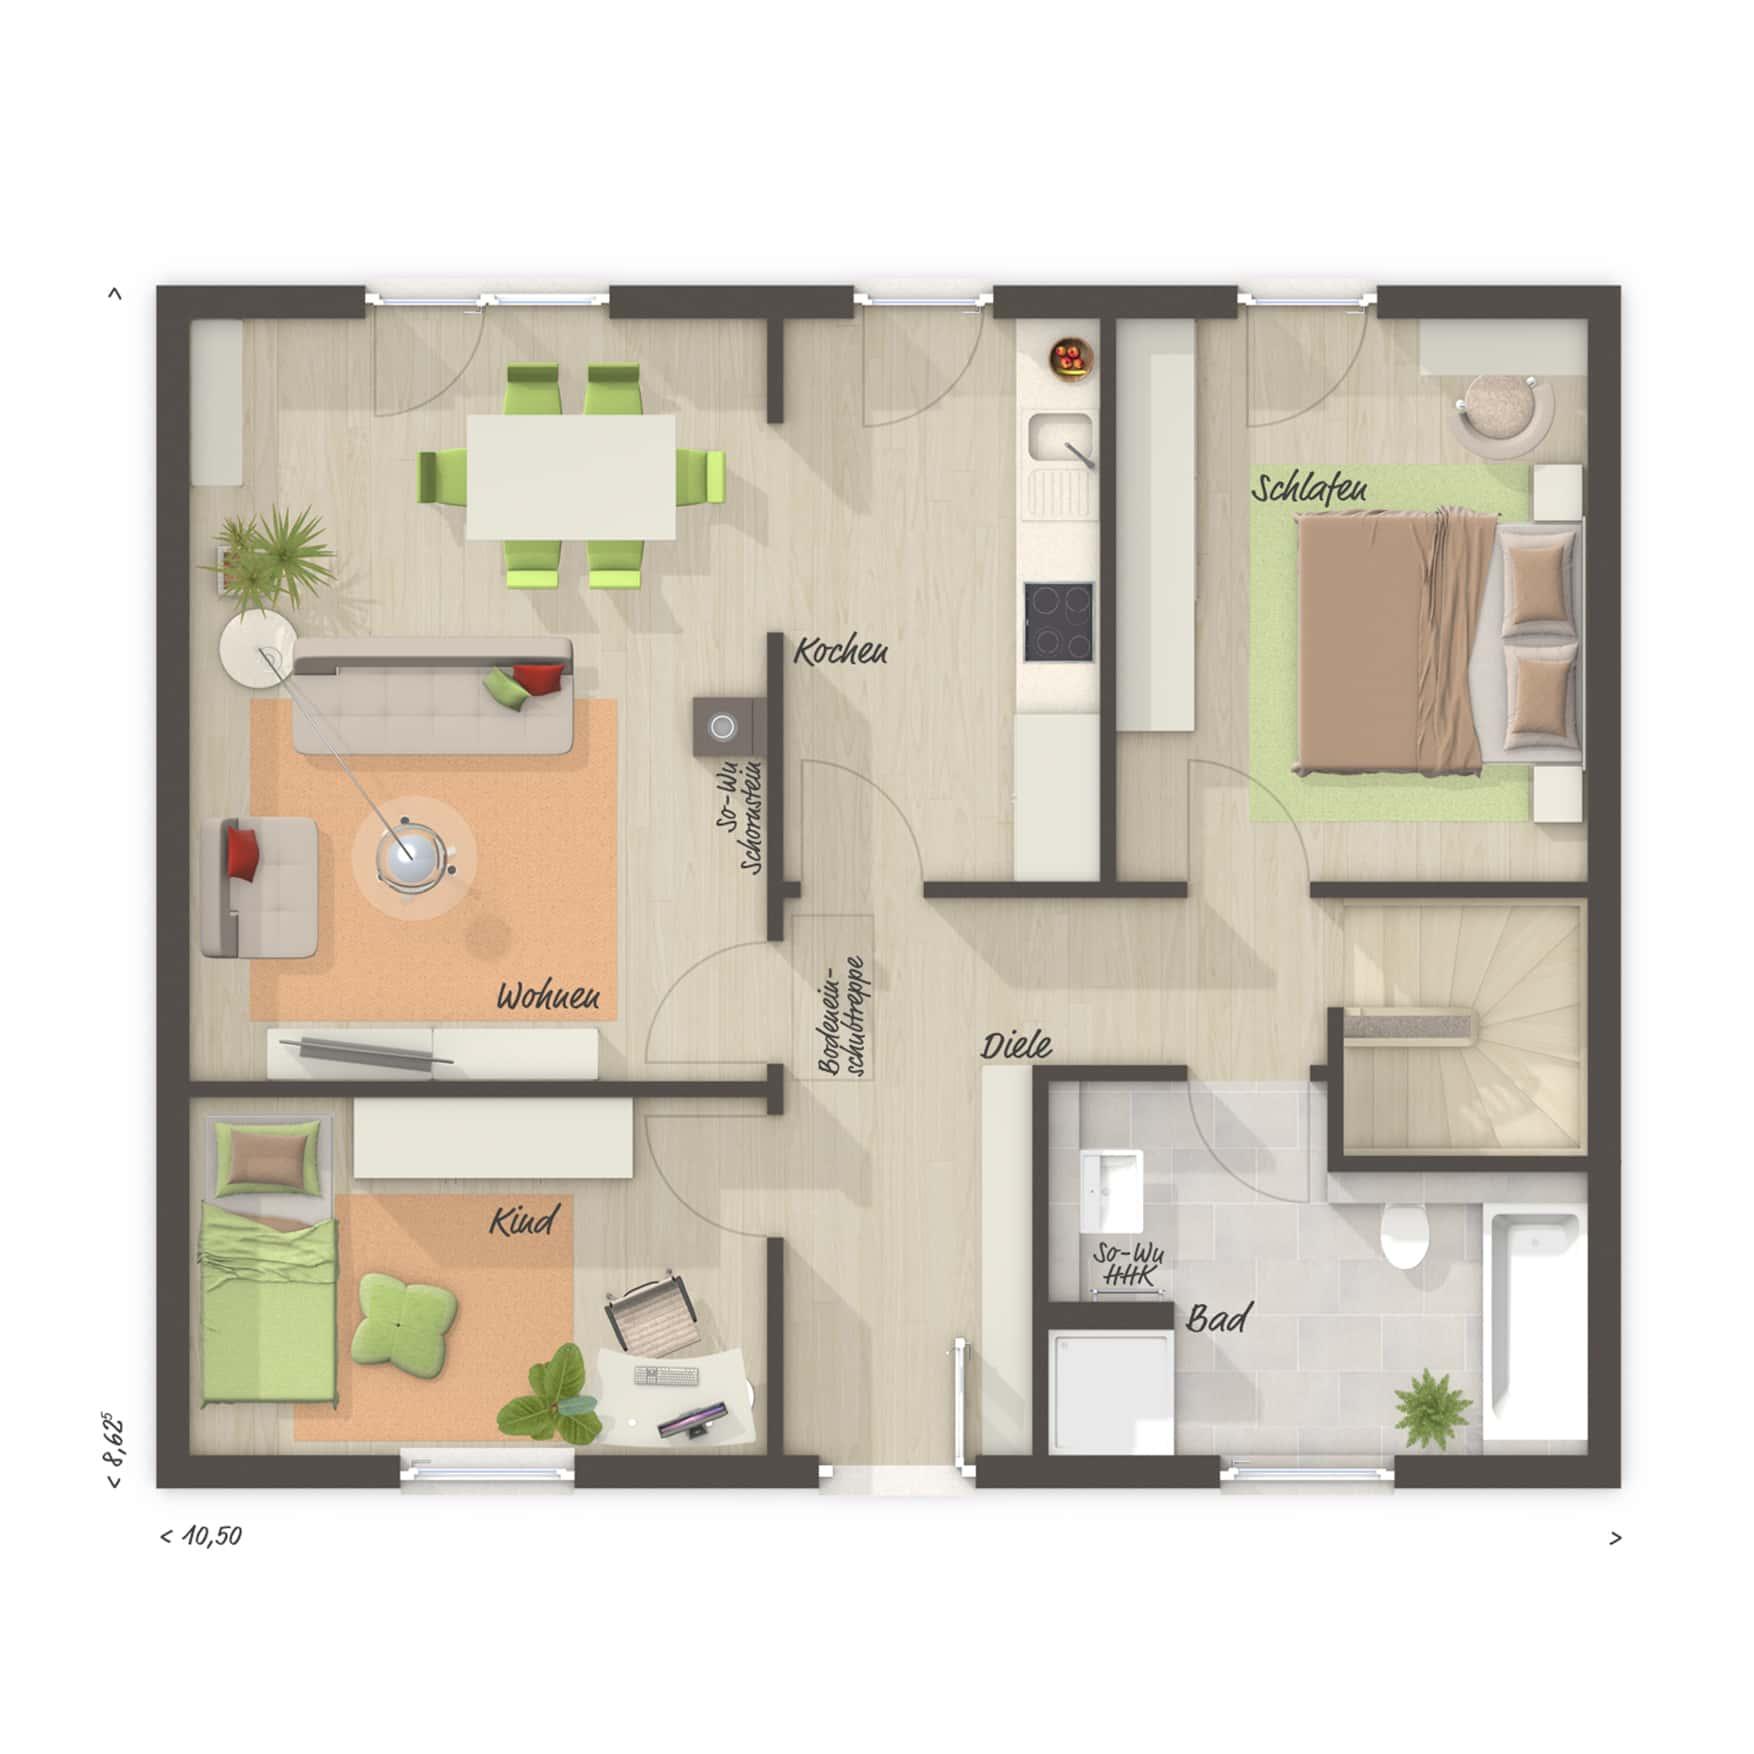 Grundriss Bungalow mit Keller, 3 Zimmer, 77 qm - Massivhaus schlüsselfertig bauen Ideen Town Country Haus BUNGALOW 78 trend - HausbauDirekt.de